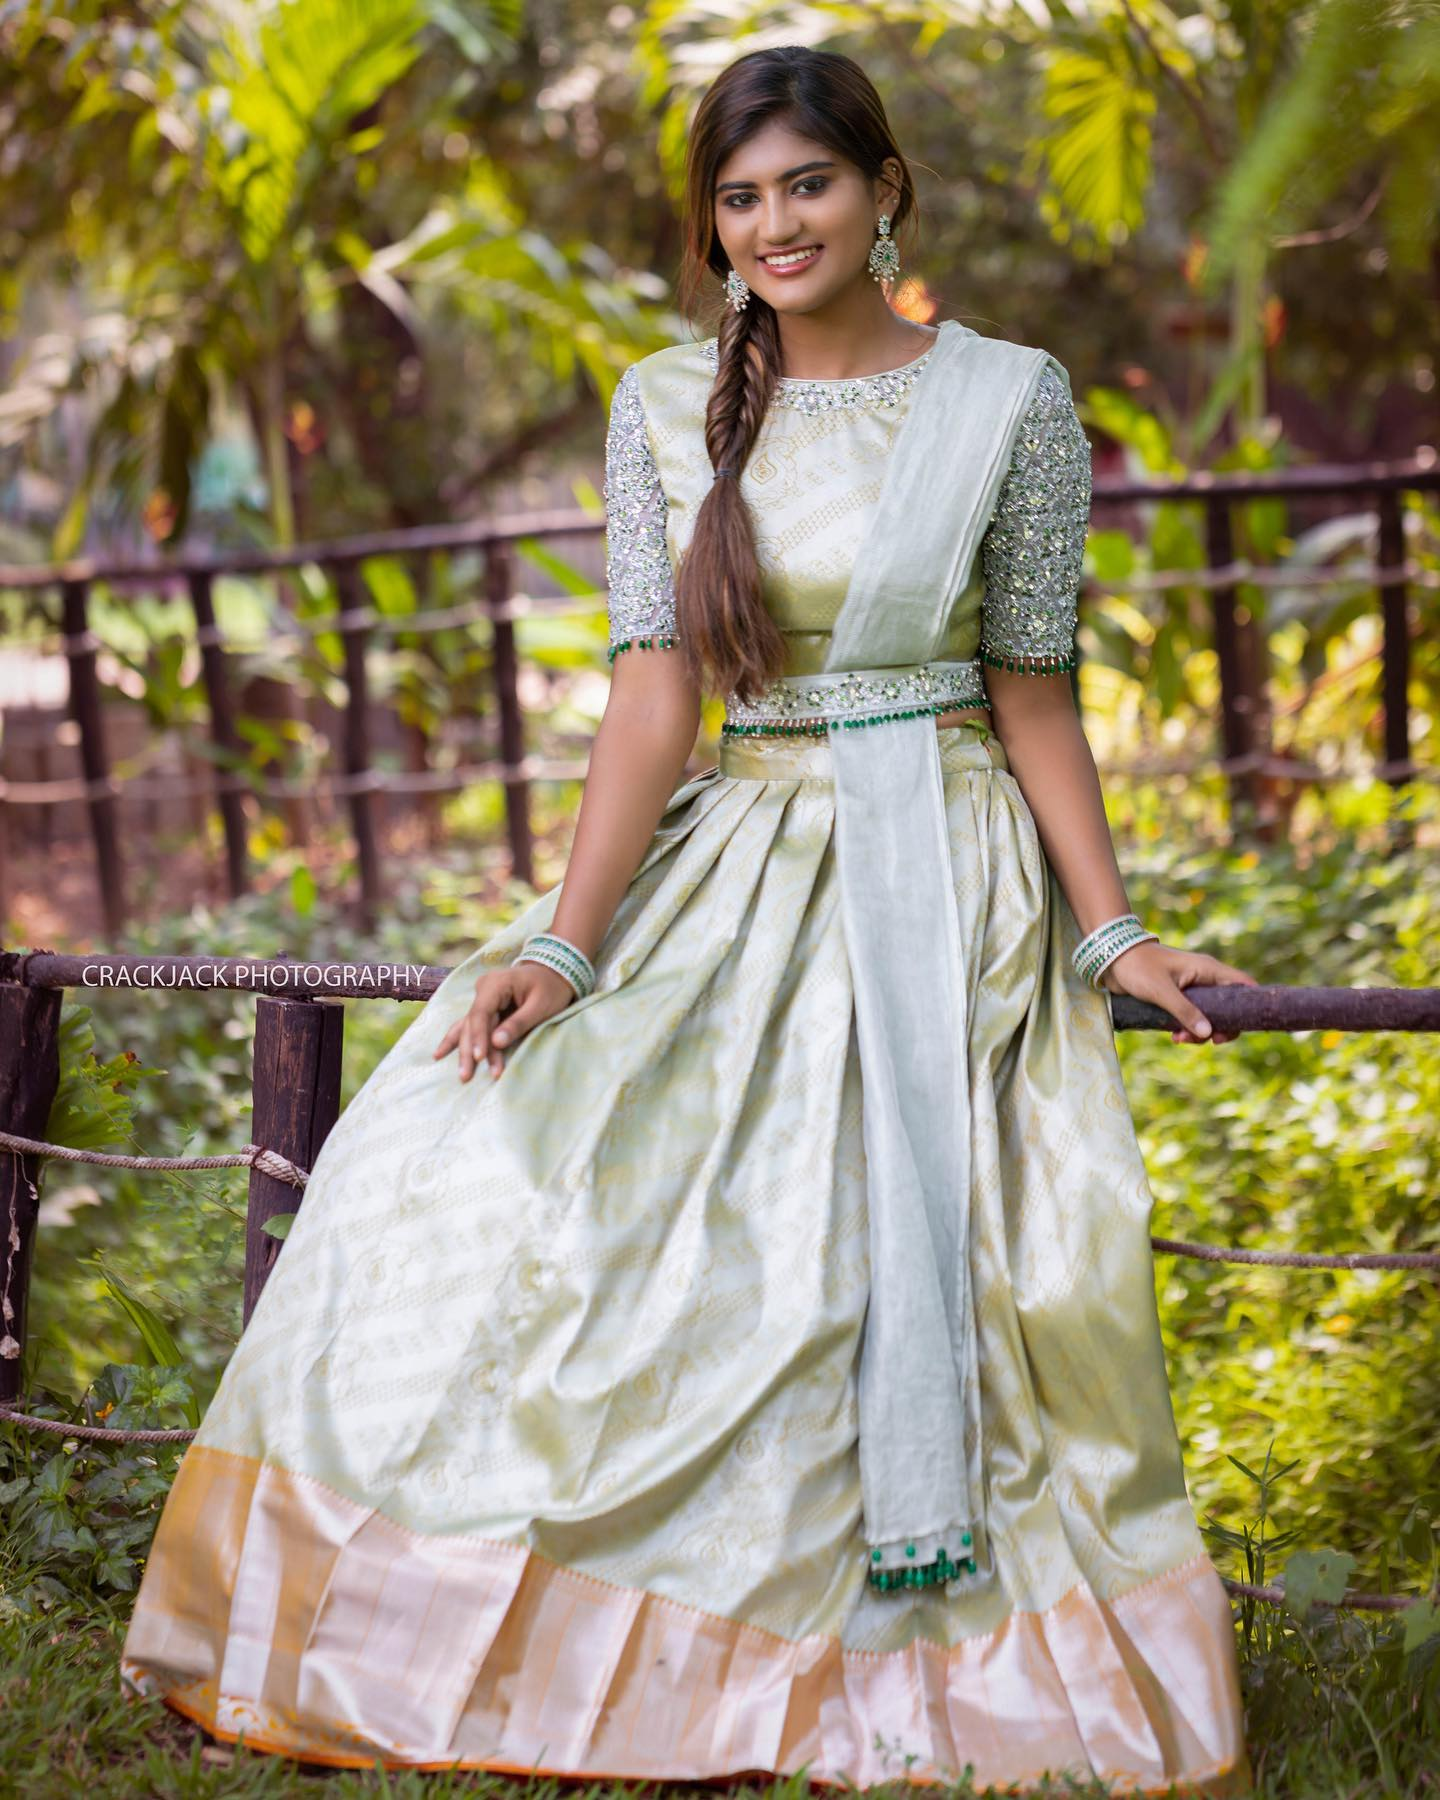 Stunning pista green colorbenarasi lehenga and blouse with pattu dupatta. Blouse and waist belt with stone aari work. 2021-07-14